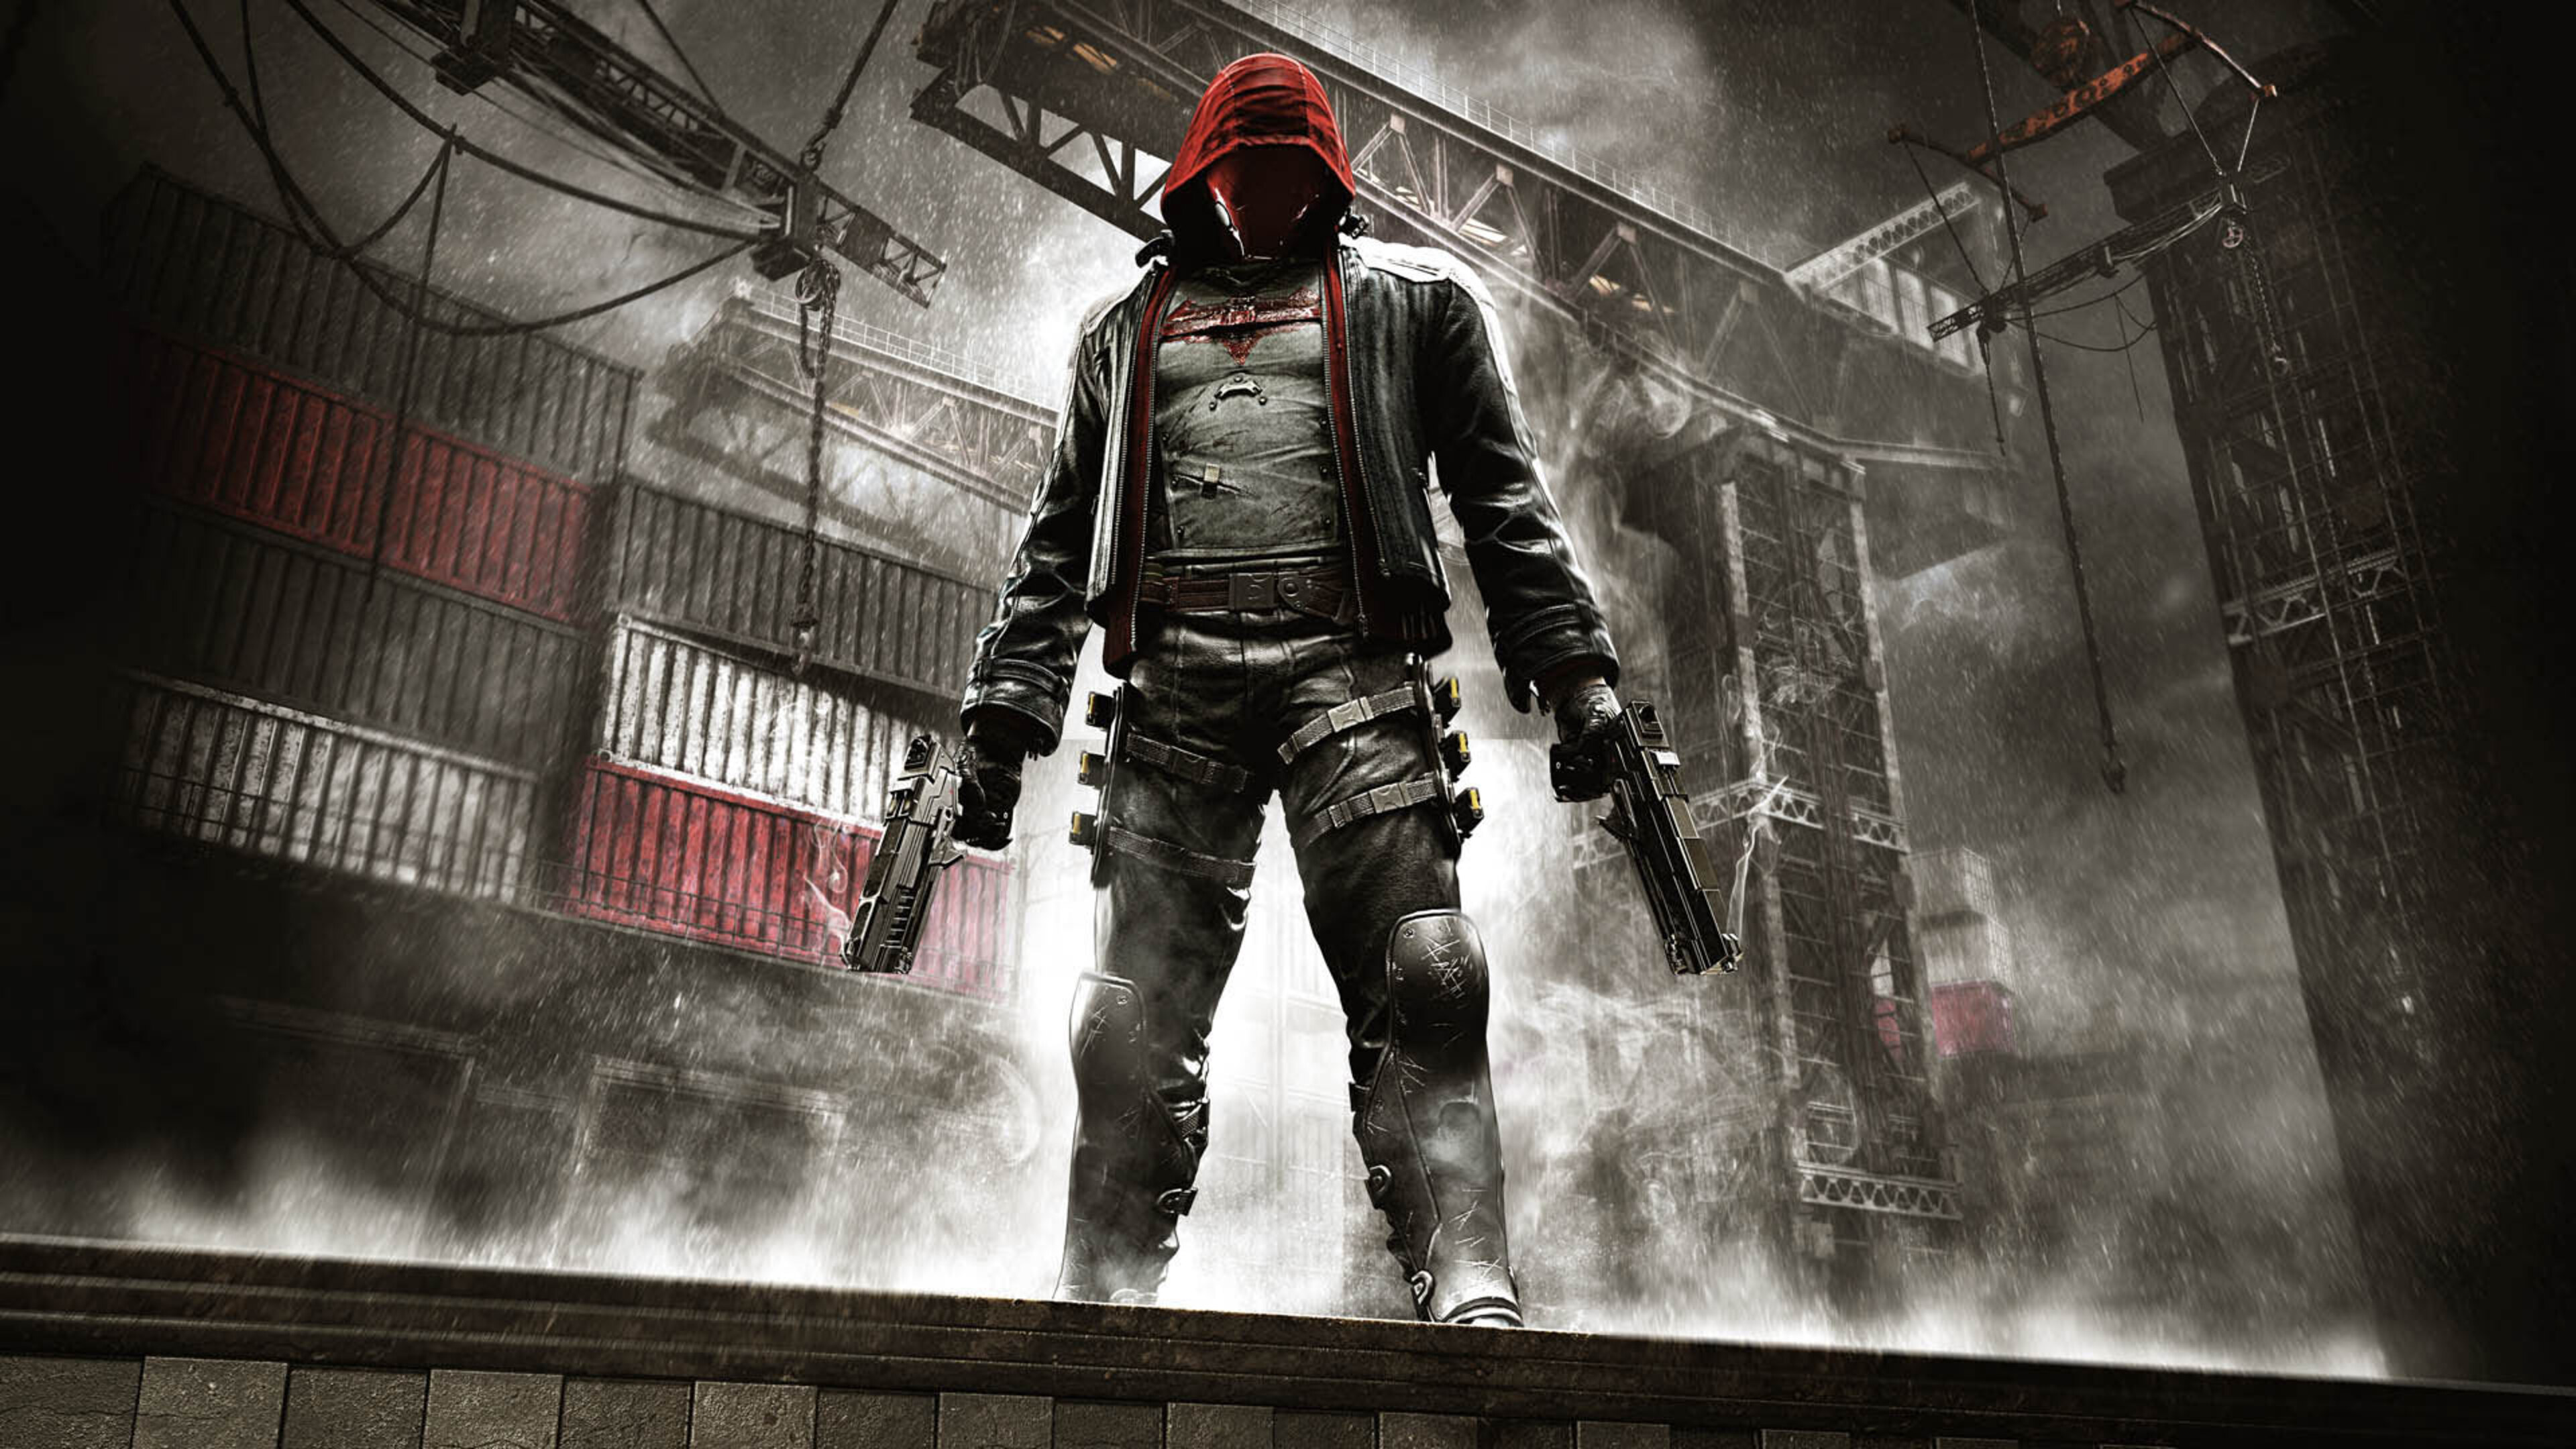 red-hood-with-guns-k0.jpg